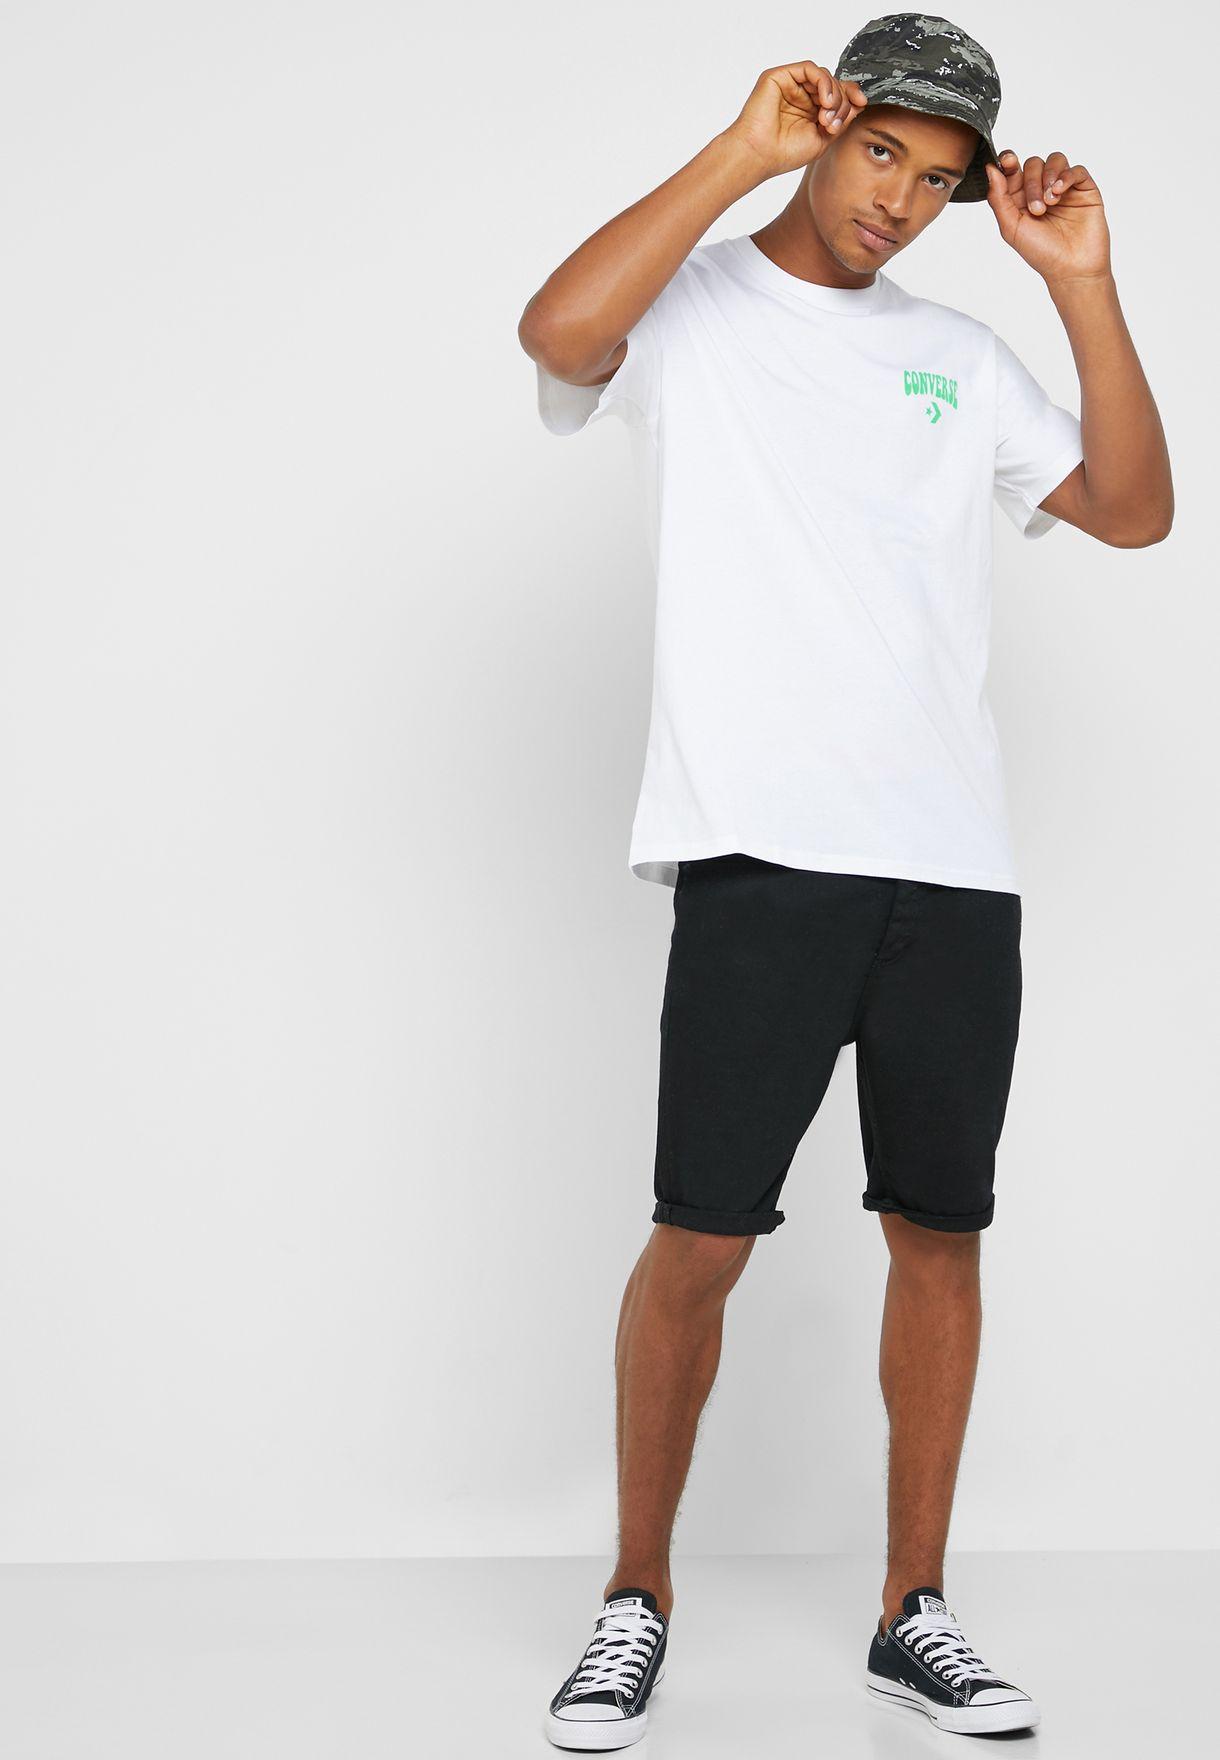 Munchy Star Chevron T-Shirt